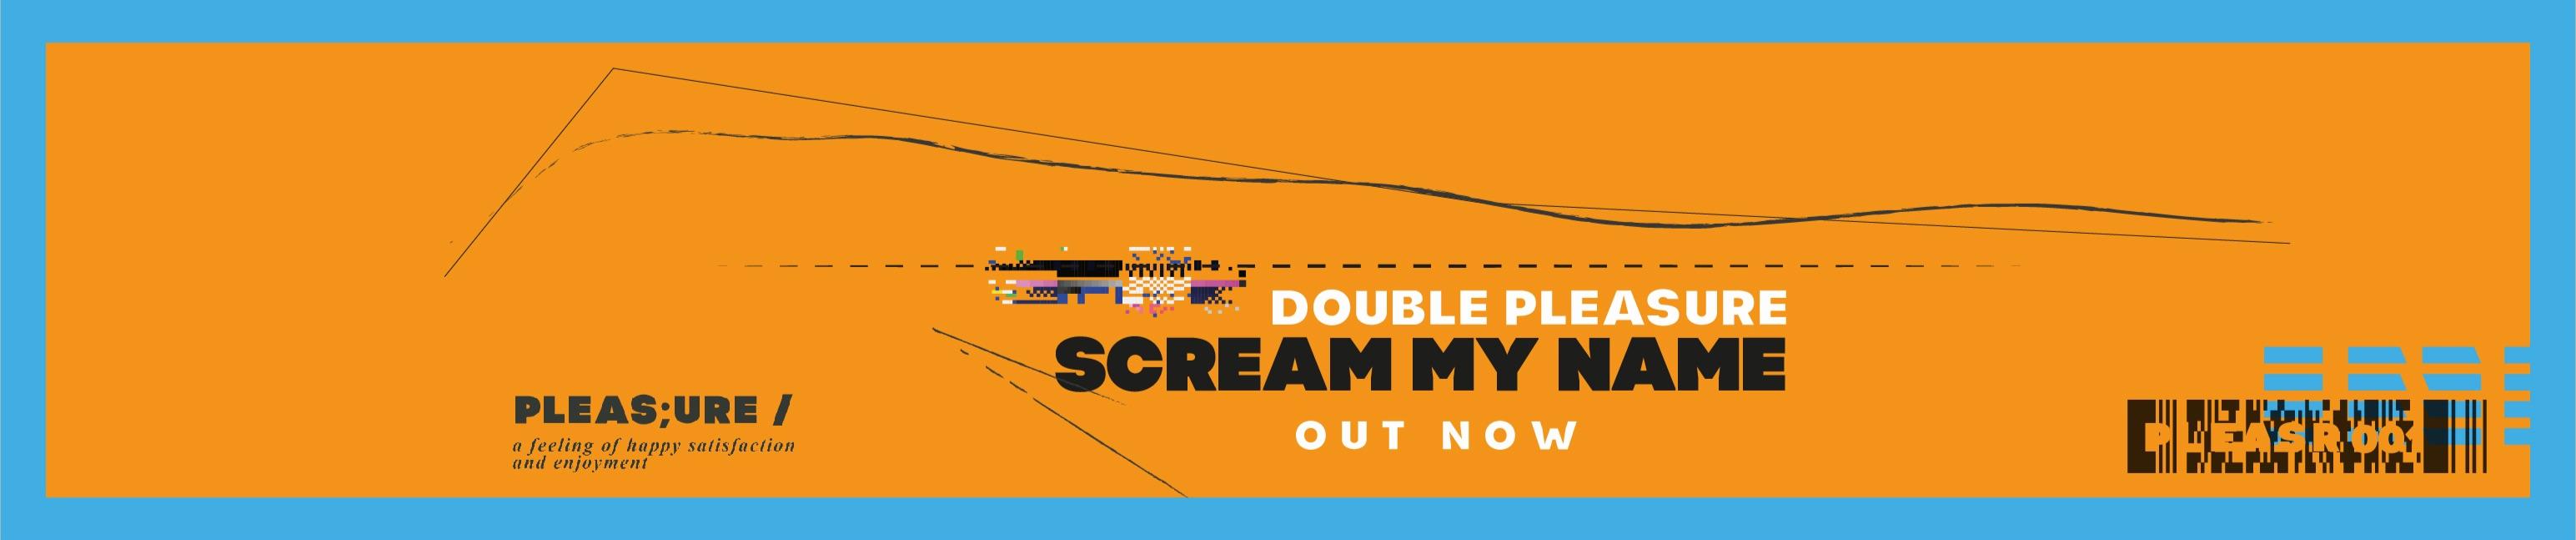 Bruno Mars - 24k Magic (Double Pleasure Bootleg) FREE DOWNLOAD by